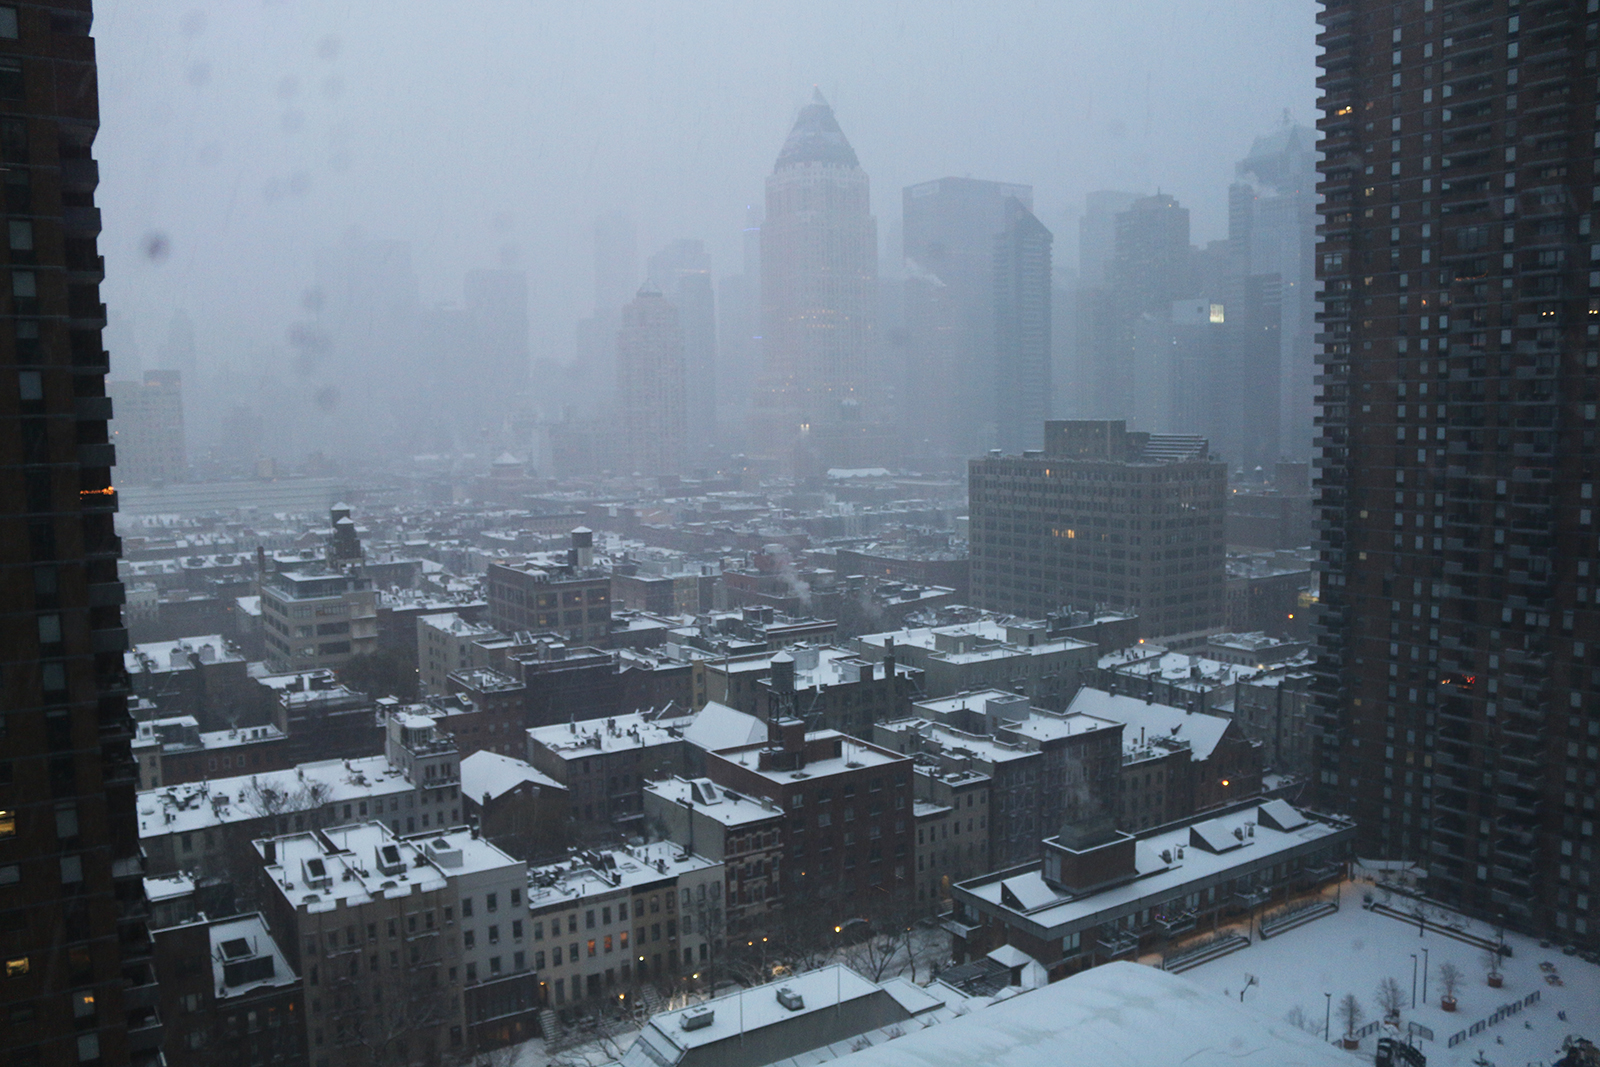 Stedentrip New York in december: sneeuw